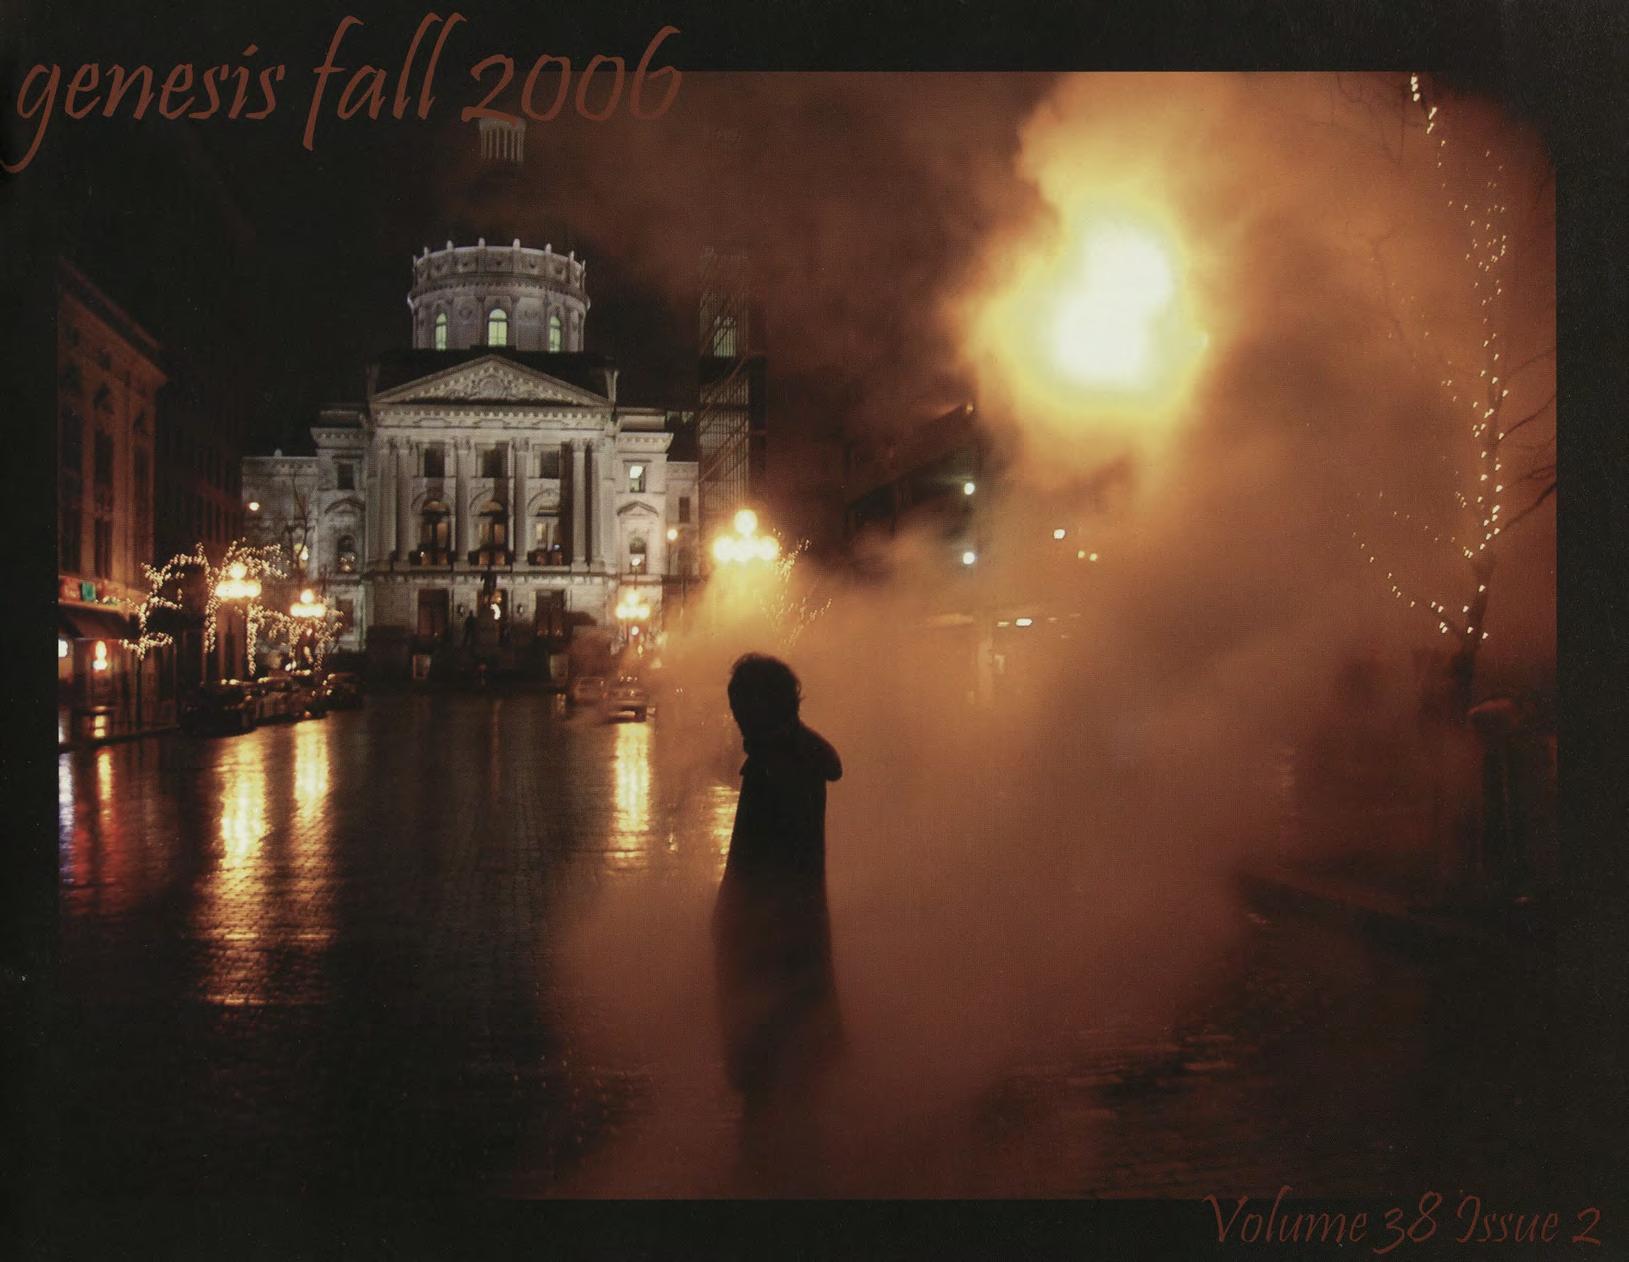 genesis fall 2006 cover